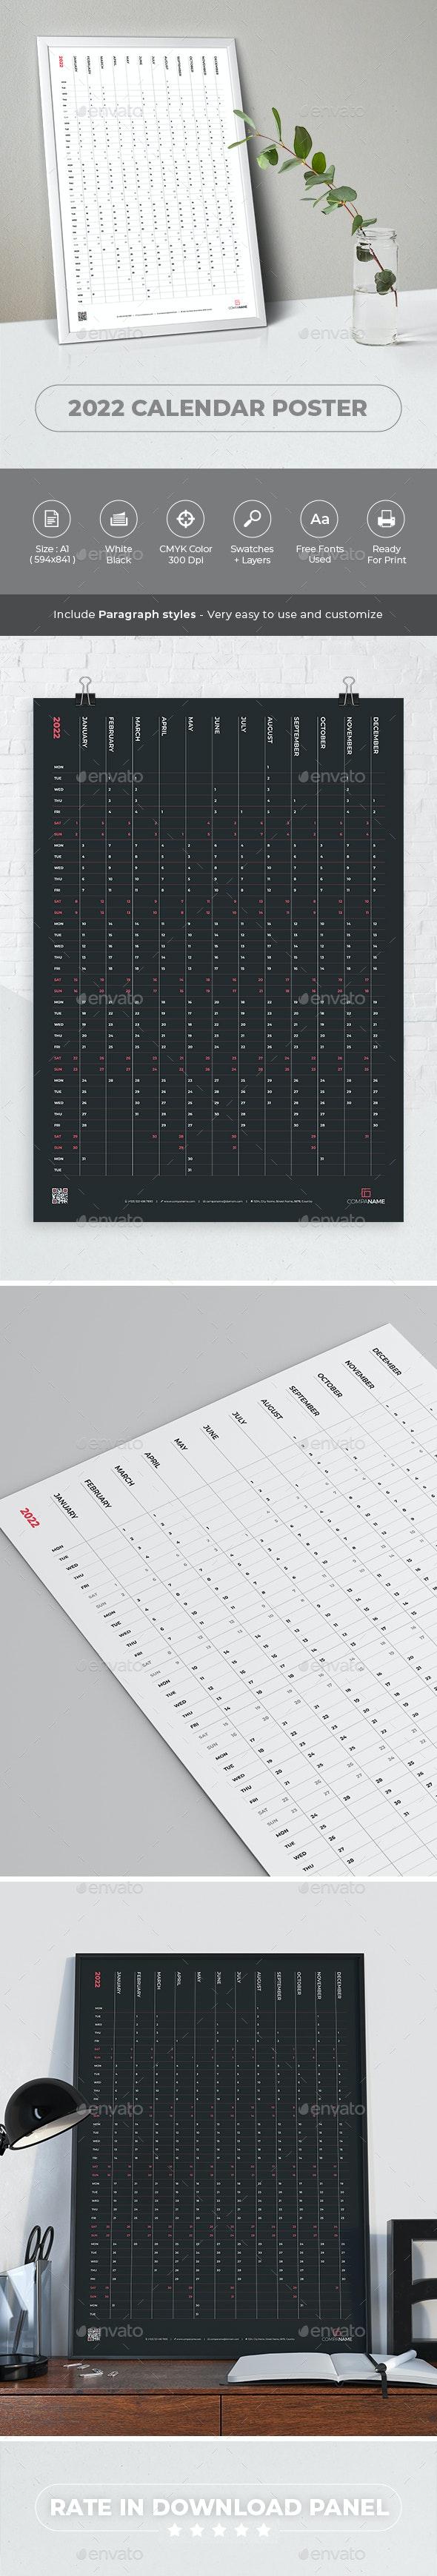 2022 Calendar Poster - Calendars Stationery